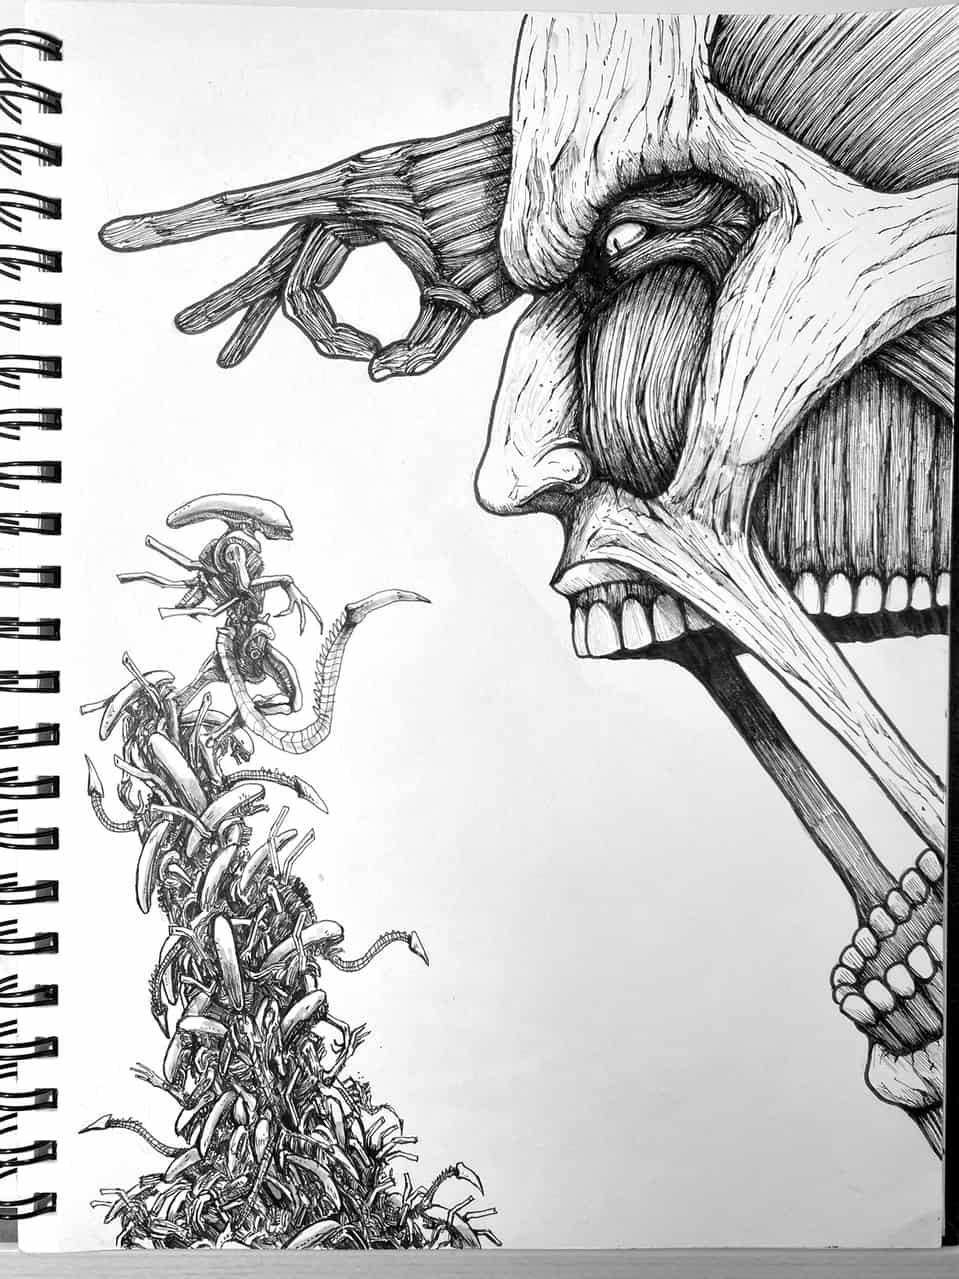 【Drawing】Colossal Titan V.S alien / art / Timelaps Illust of chuanchieh villain drawing ColossalTitan ペン画 alien art illustration fanfic AttackonTitan sketch